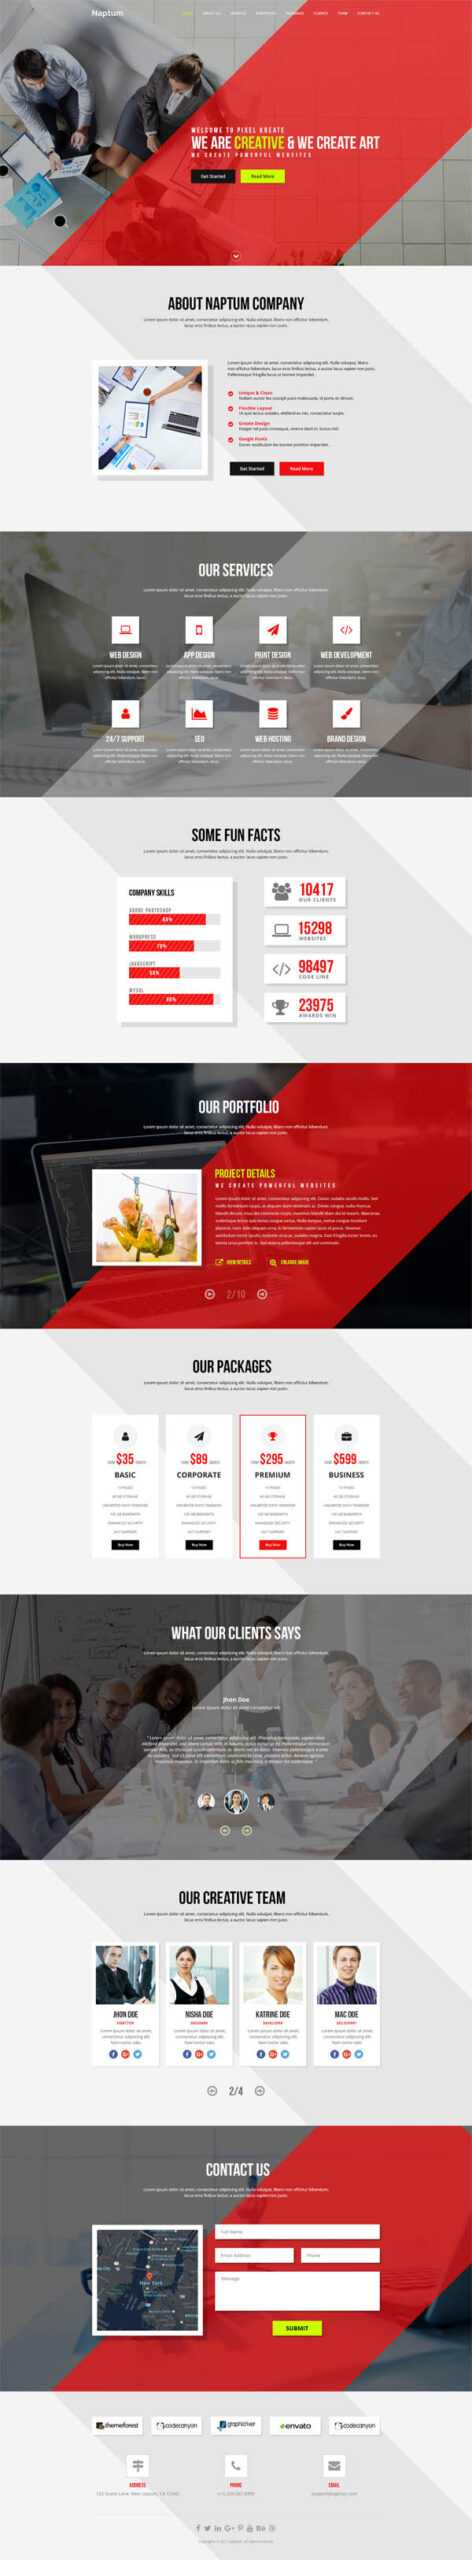 Best Single Page Web Templates | Web Design | Graphic Design Throughout Single Page Brochure Templates Psd